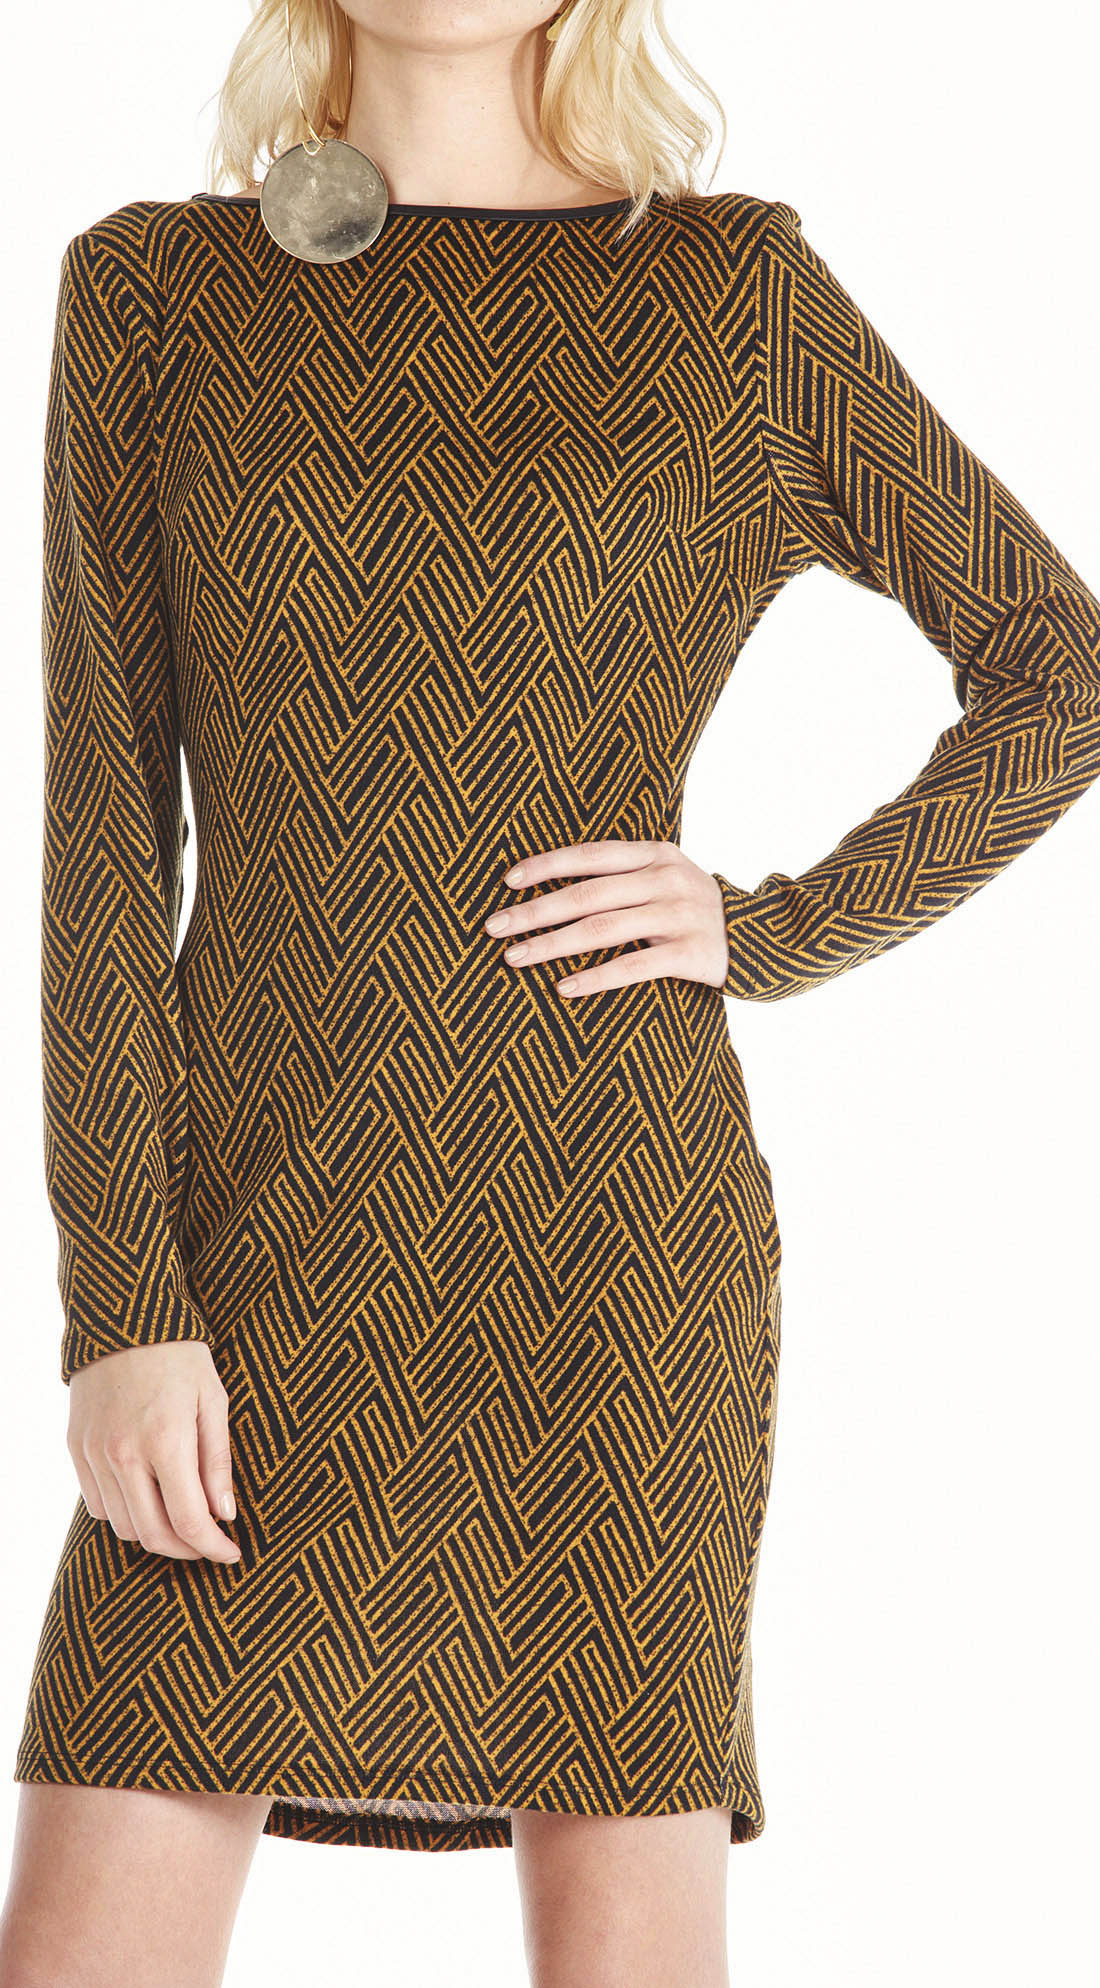 b1fafea603 Vestido Manga Longa Estampa Geometrica Preto Mostarda - morenarosa